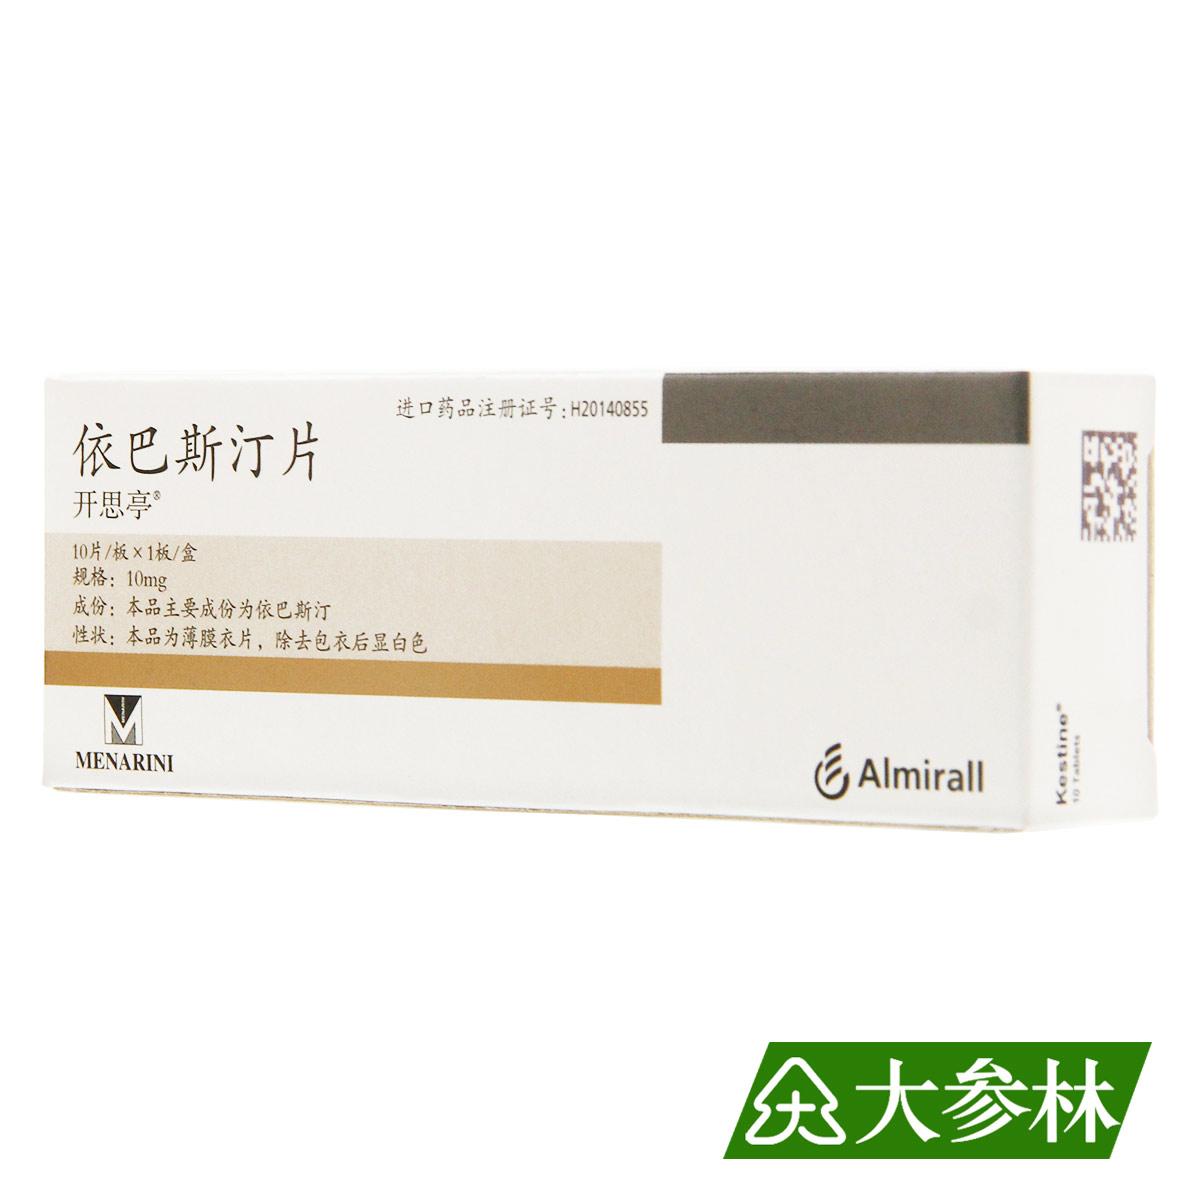 Kai Si Ting Kai Si Ting Ebastine таблетки 10 мг * 10 таблеток / коробка